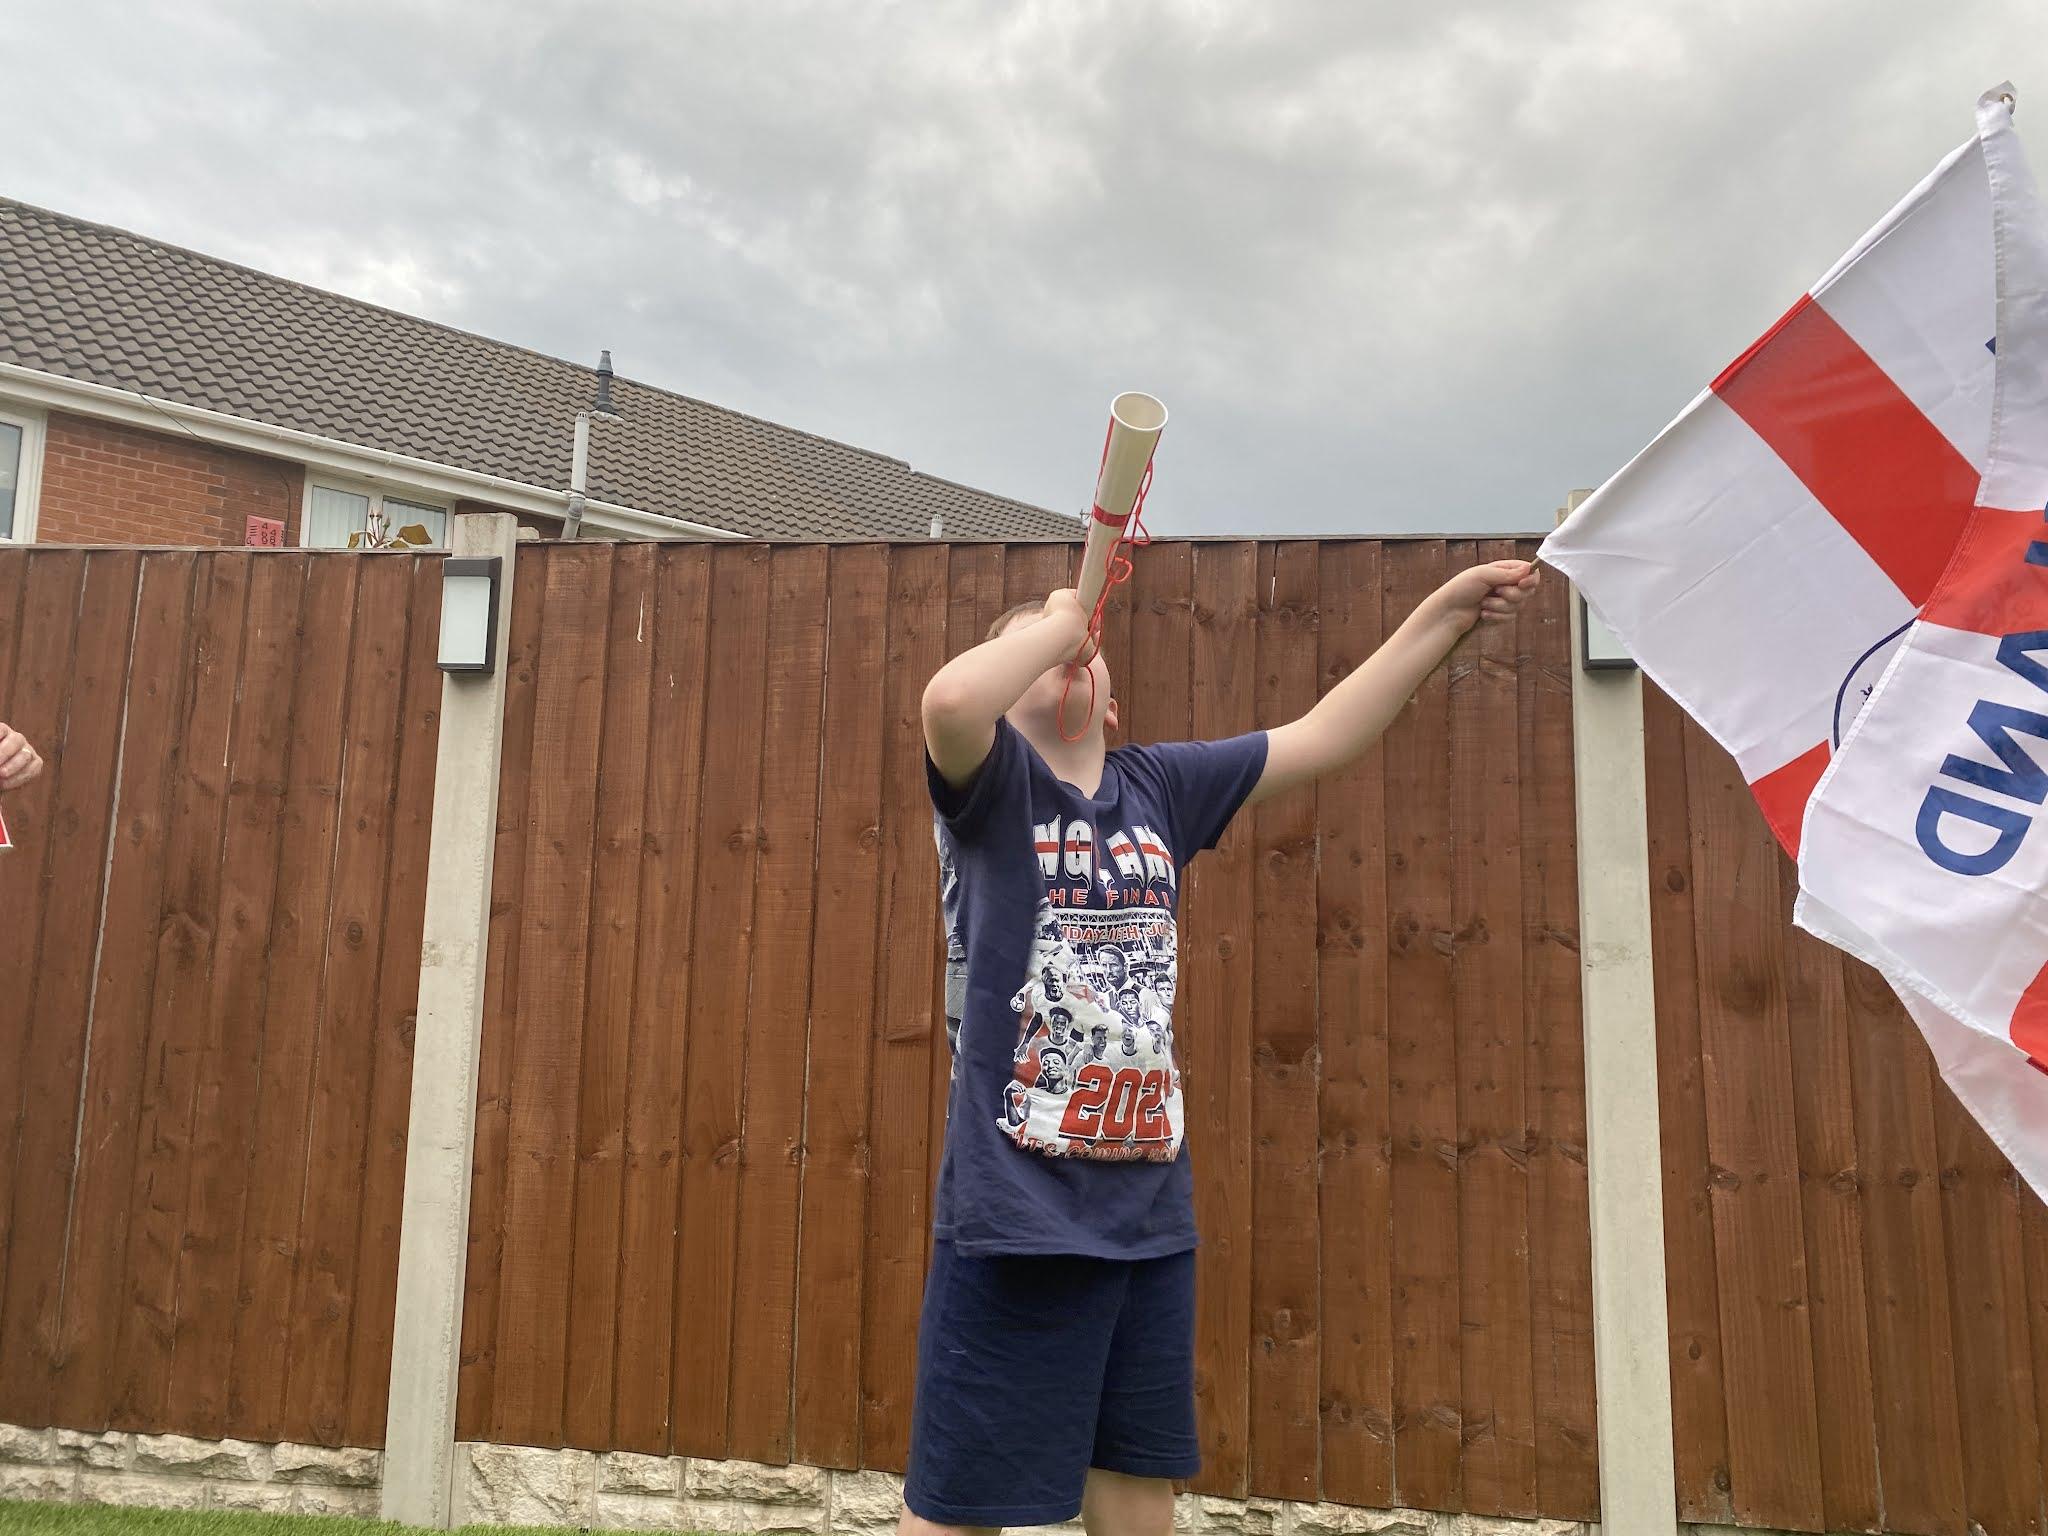 boy waving an england flag